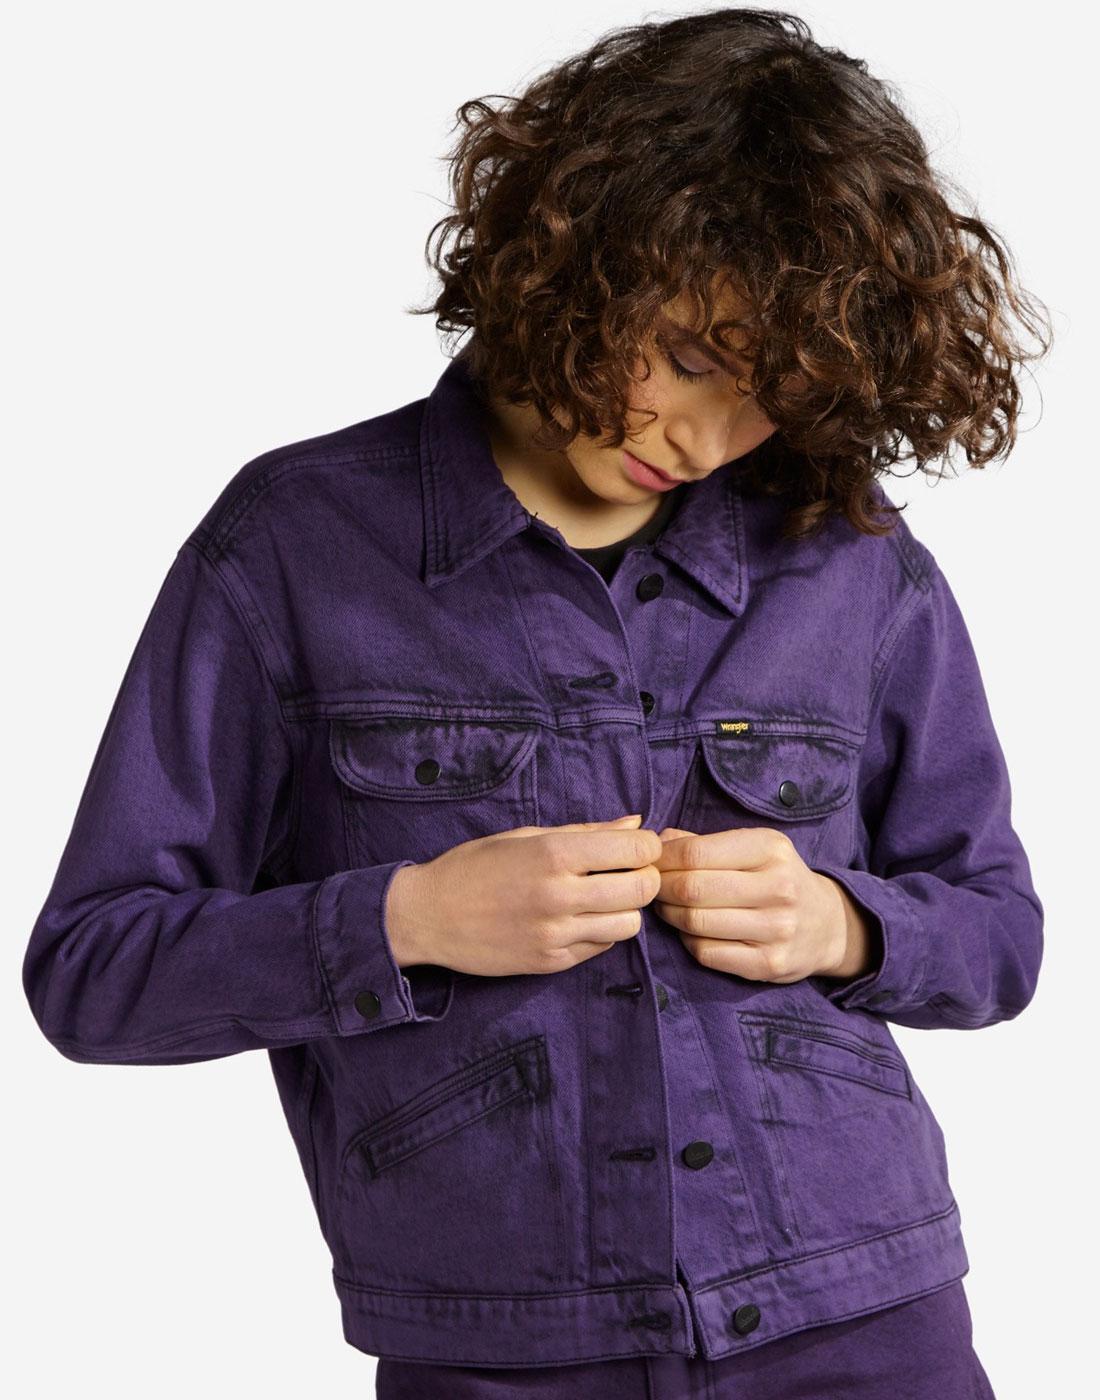 WRANGLER Womens 70s Purple Pop Denim Retro Jacket